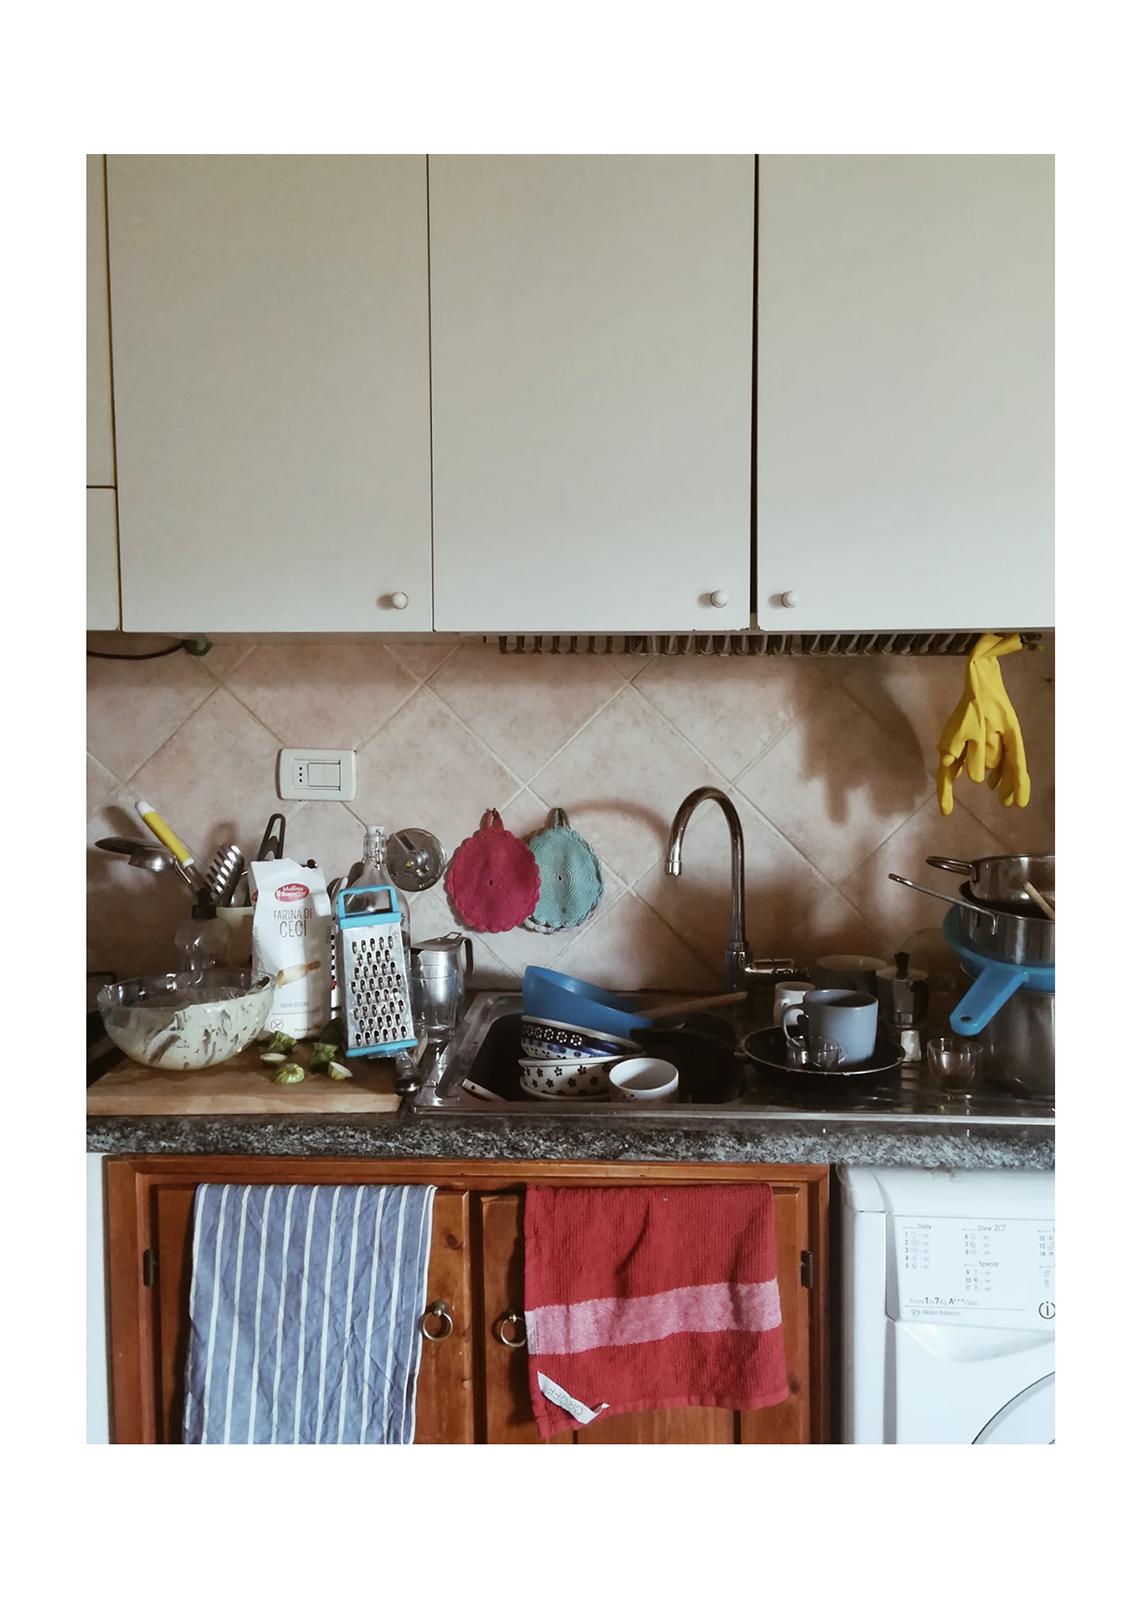 paola ressa cucine 3